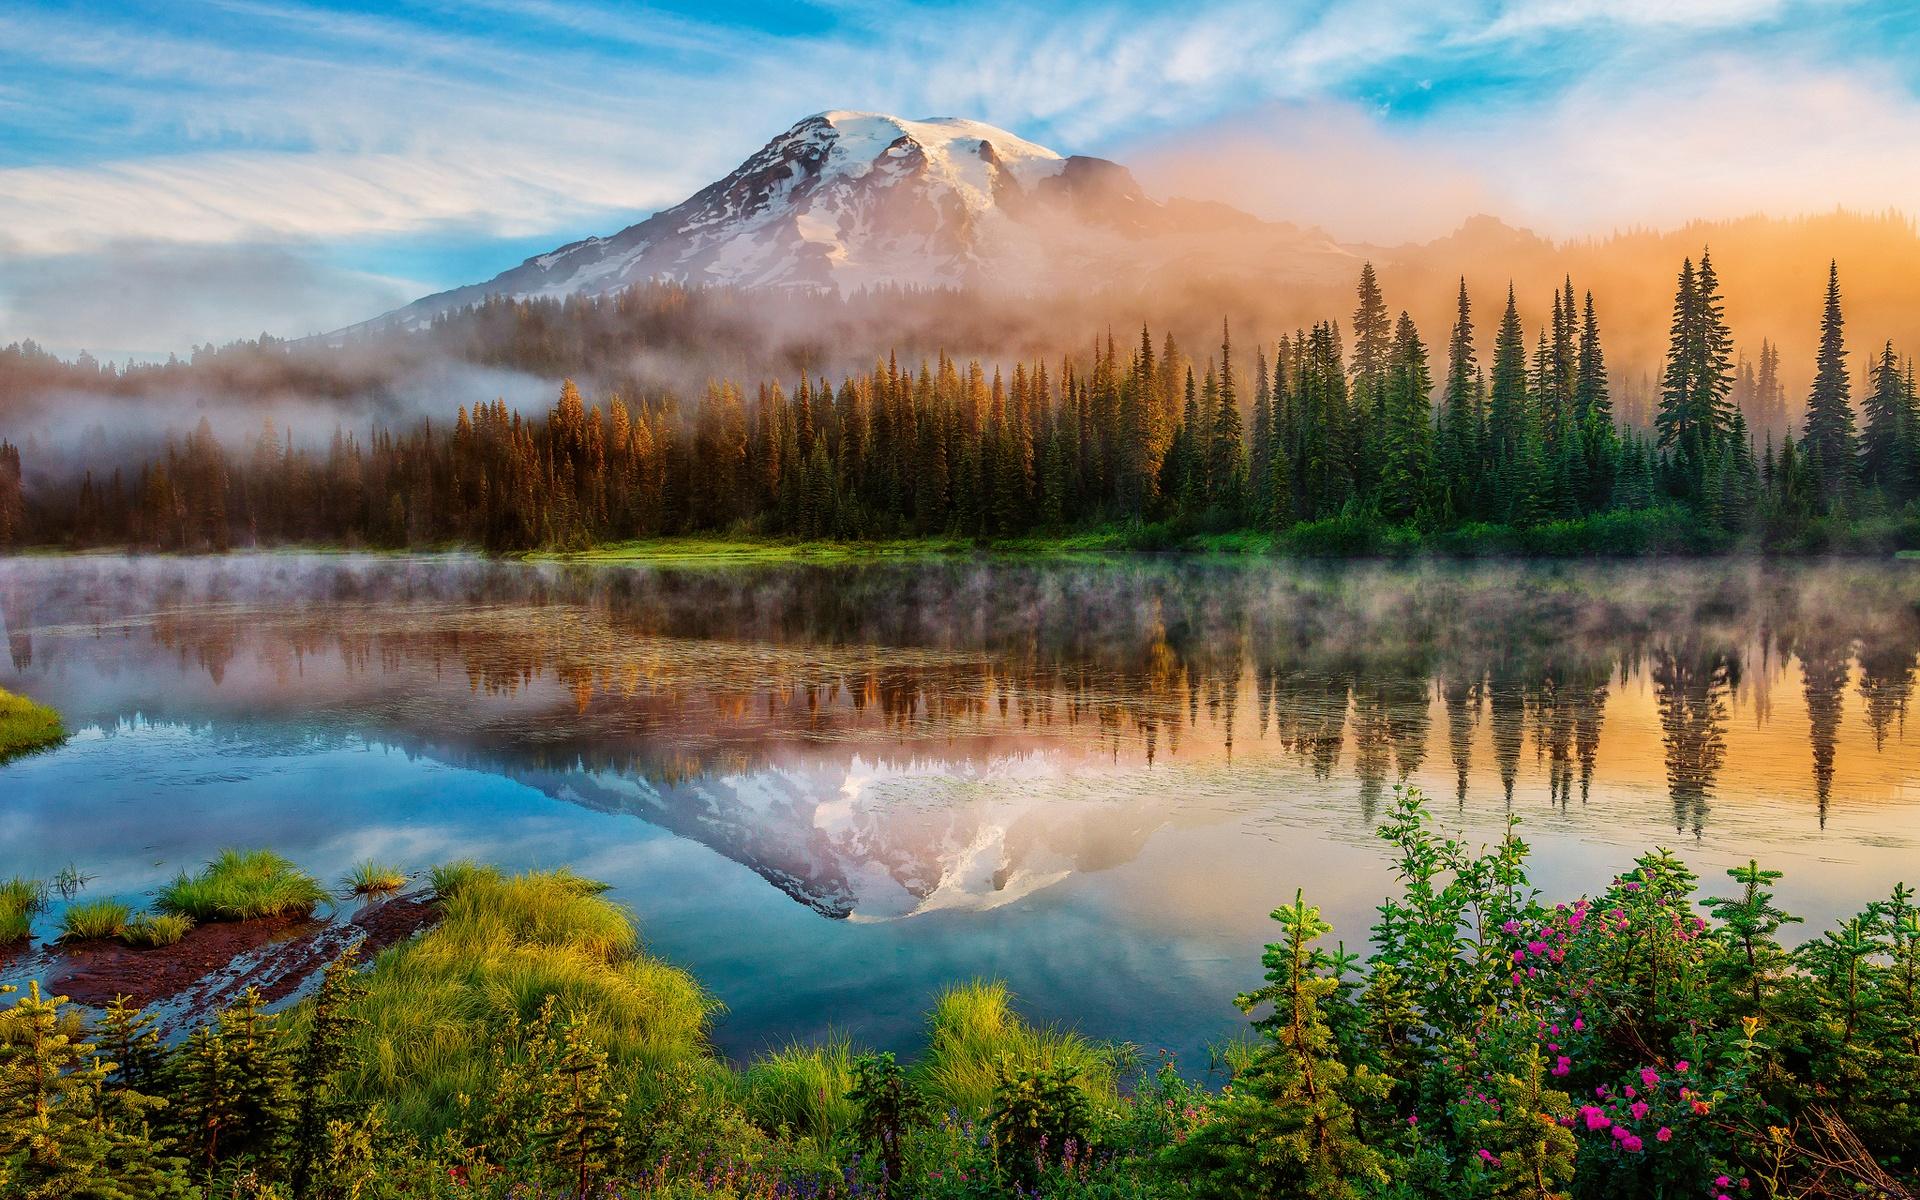 Sunrise Mountain Forest Wallpaper: Download Wallpaper 1920x1200 Washington, Cascade Mountains